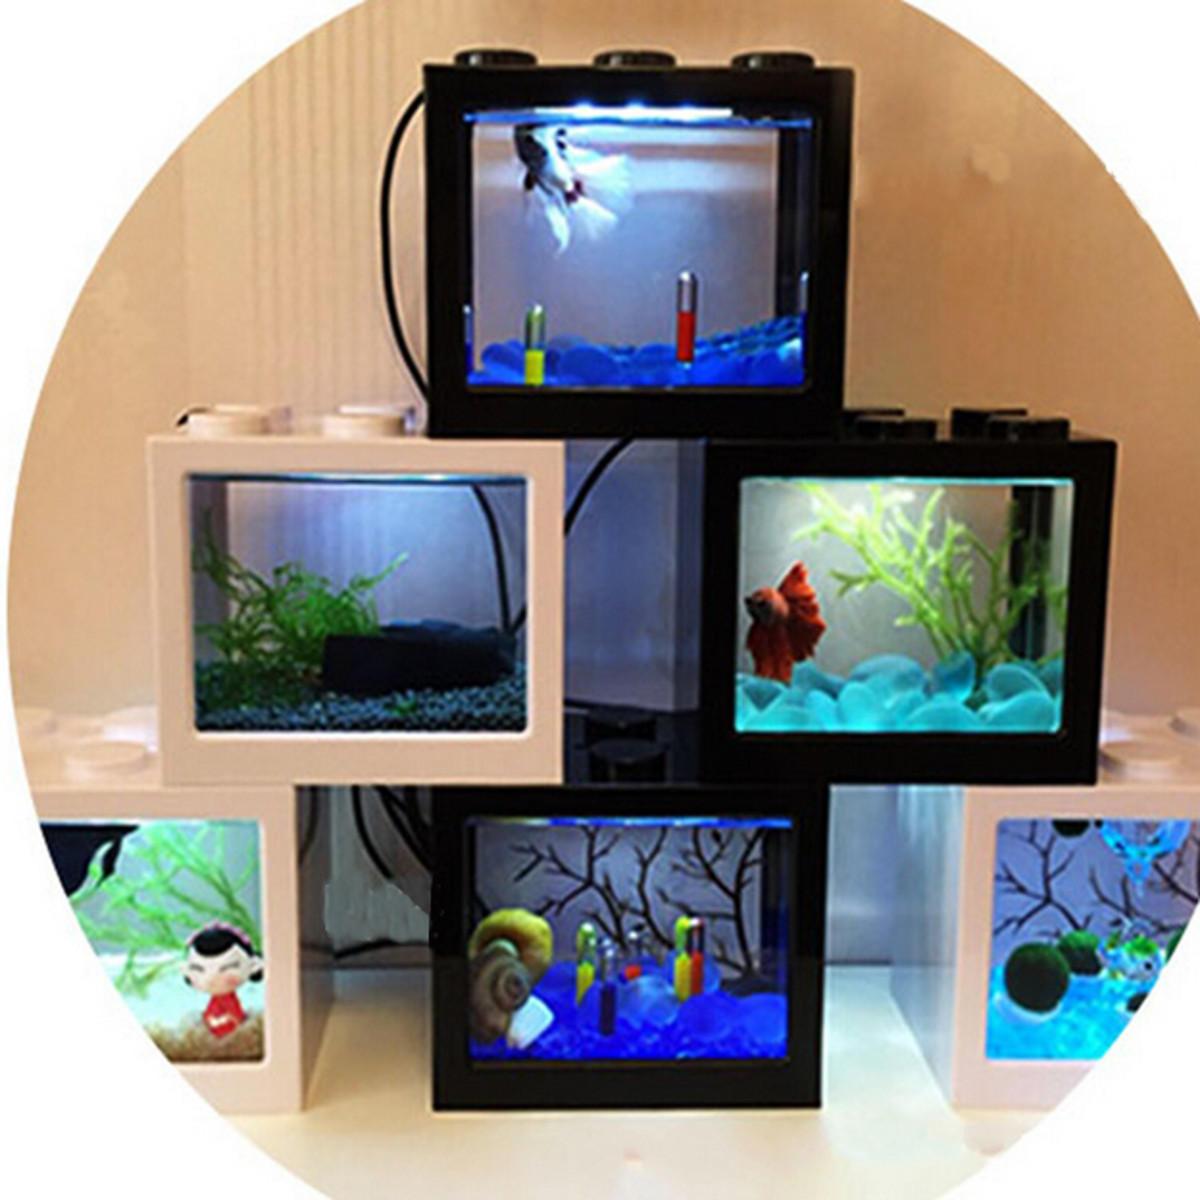 Mini Usb Led Light Clear Fish Tank Mini Aquarium Box Bettas Office Desktop Decor Fish Aquatic Pets From Pet Supplies On Banggood Com Sao Tome And Principe Bouvet Island St Pierre